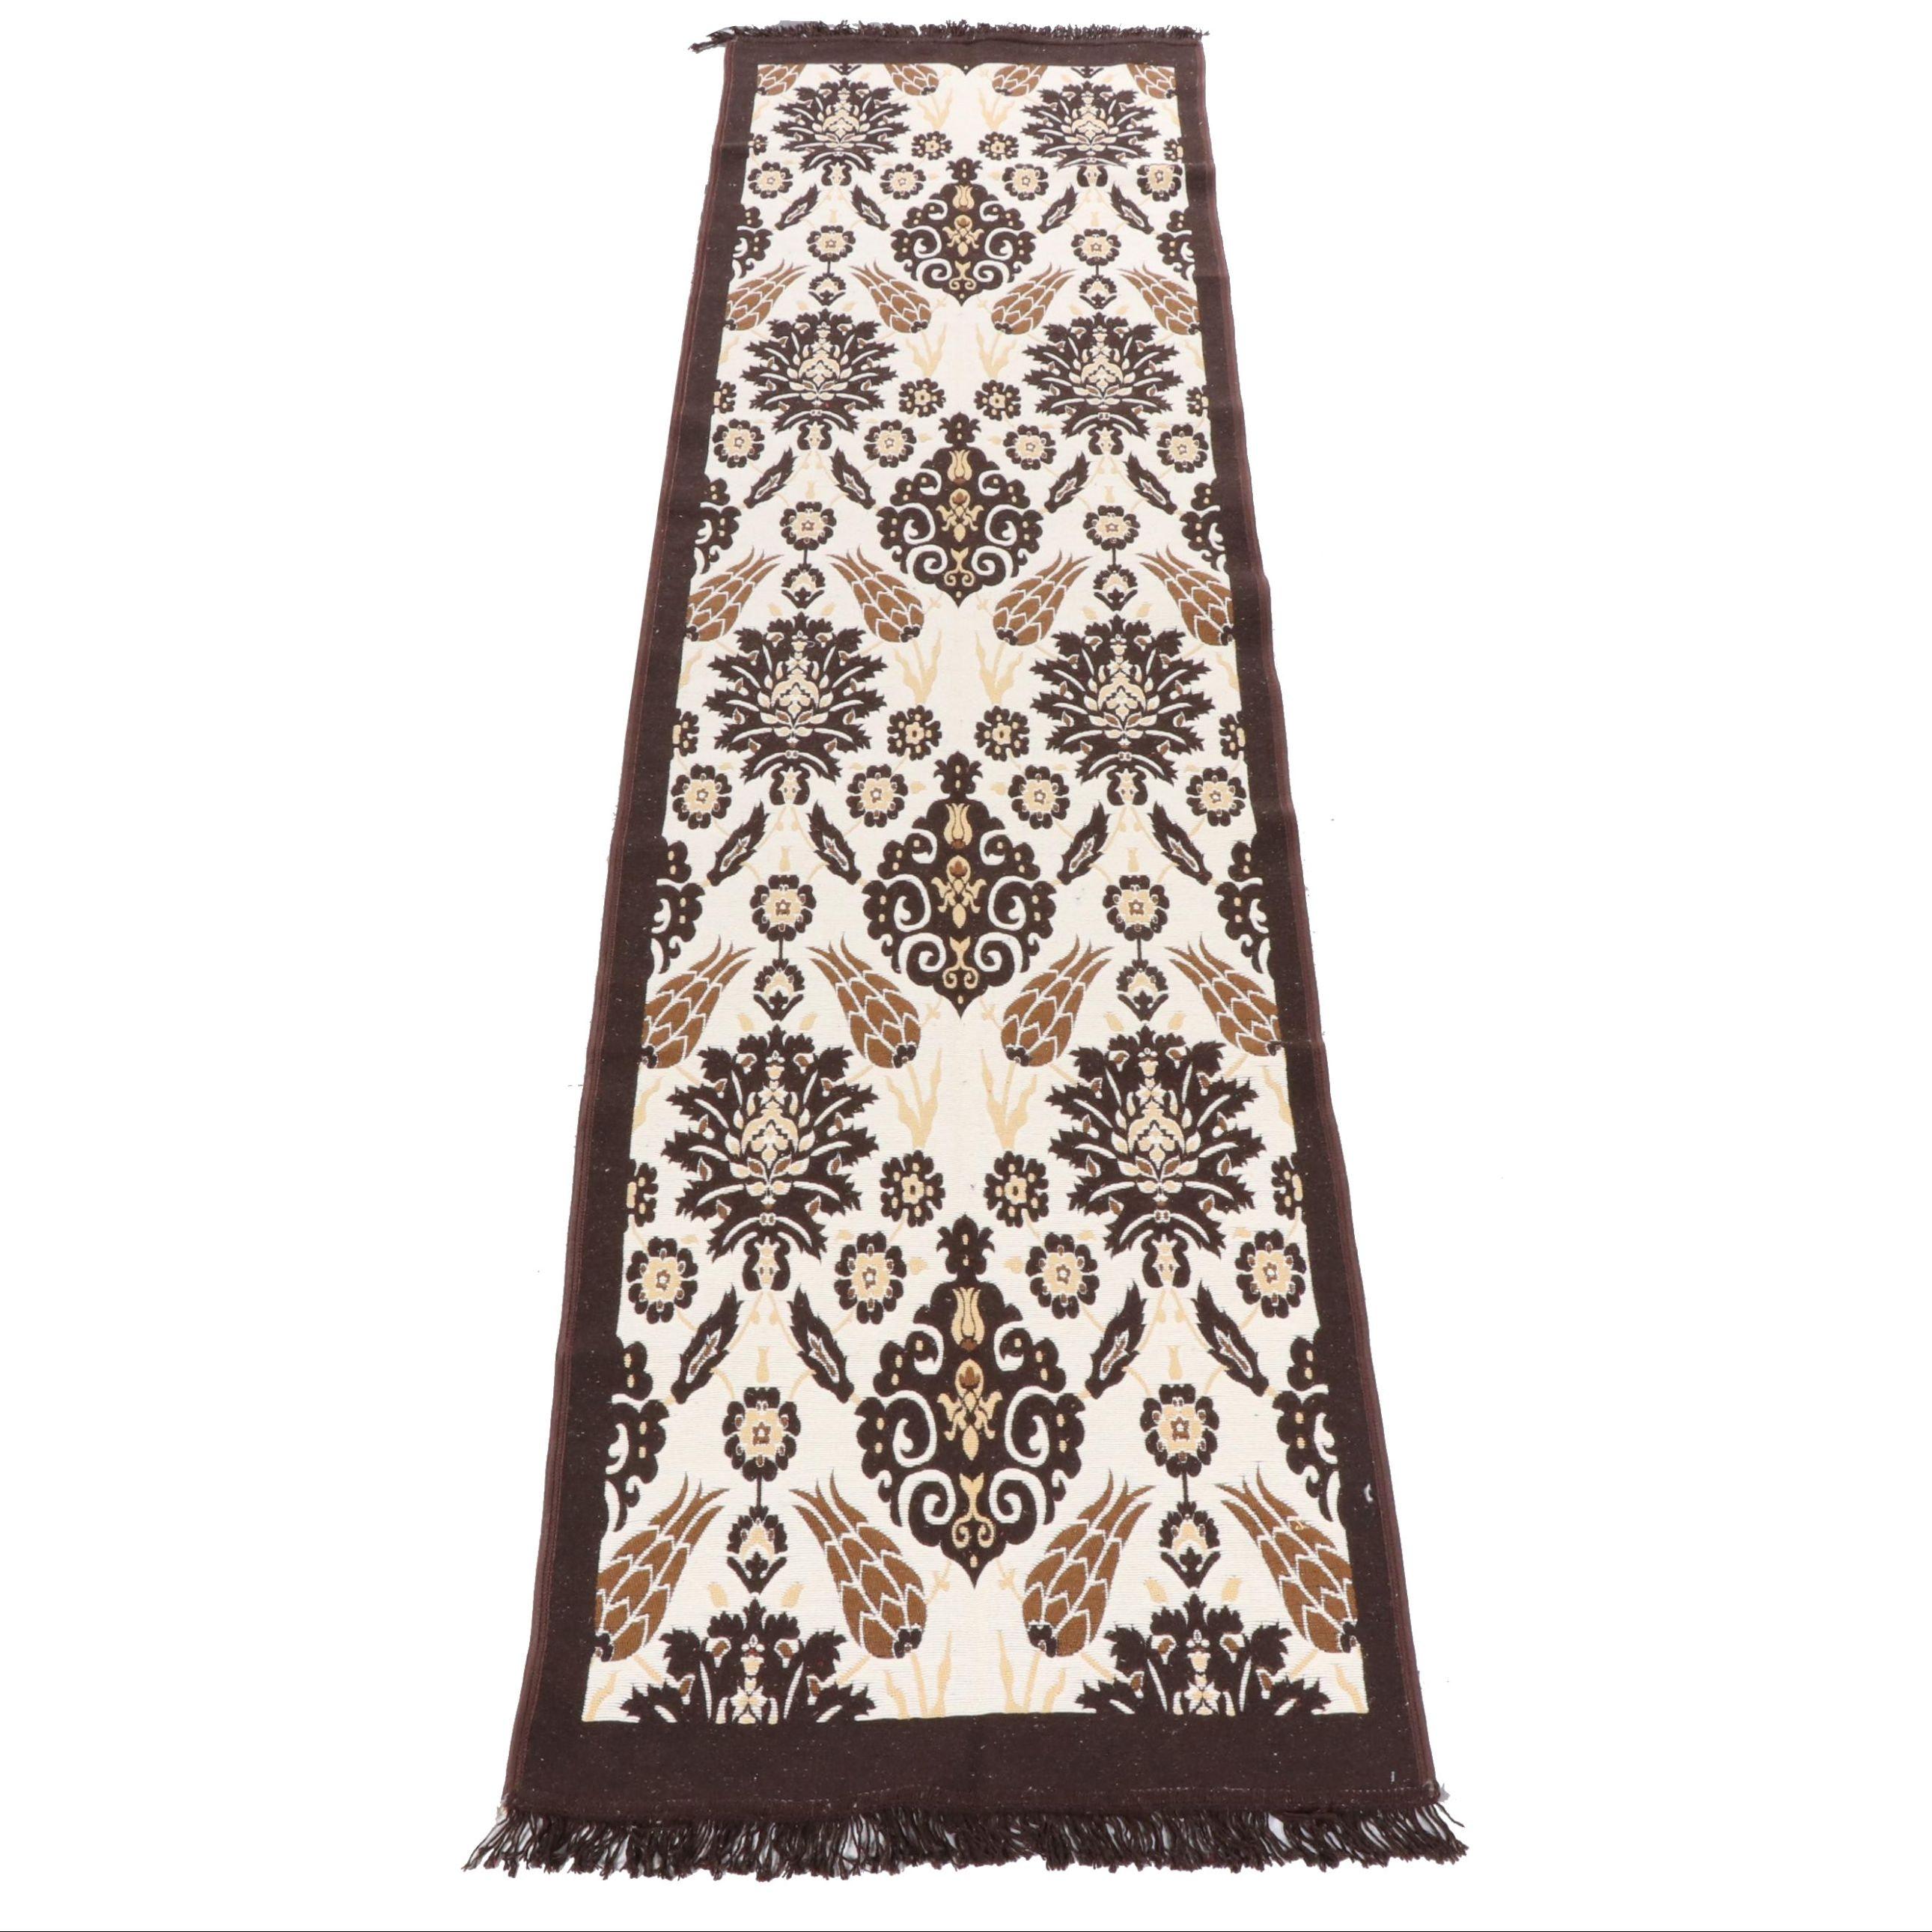 Machine Made Turkish Wool and Cotton Blend Kilim Carpet Runner